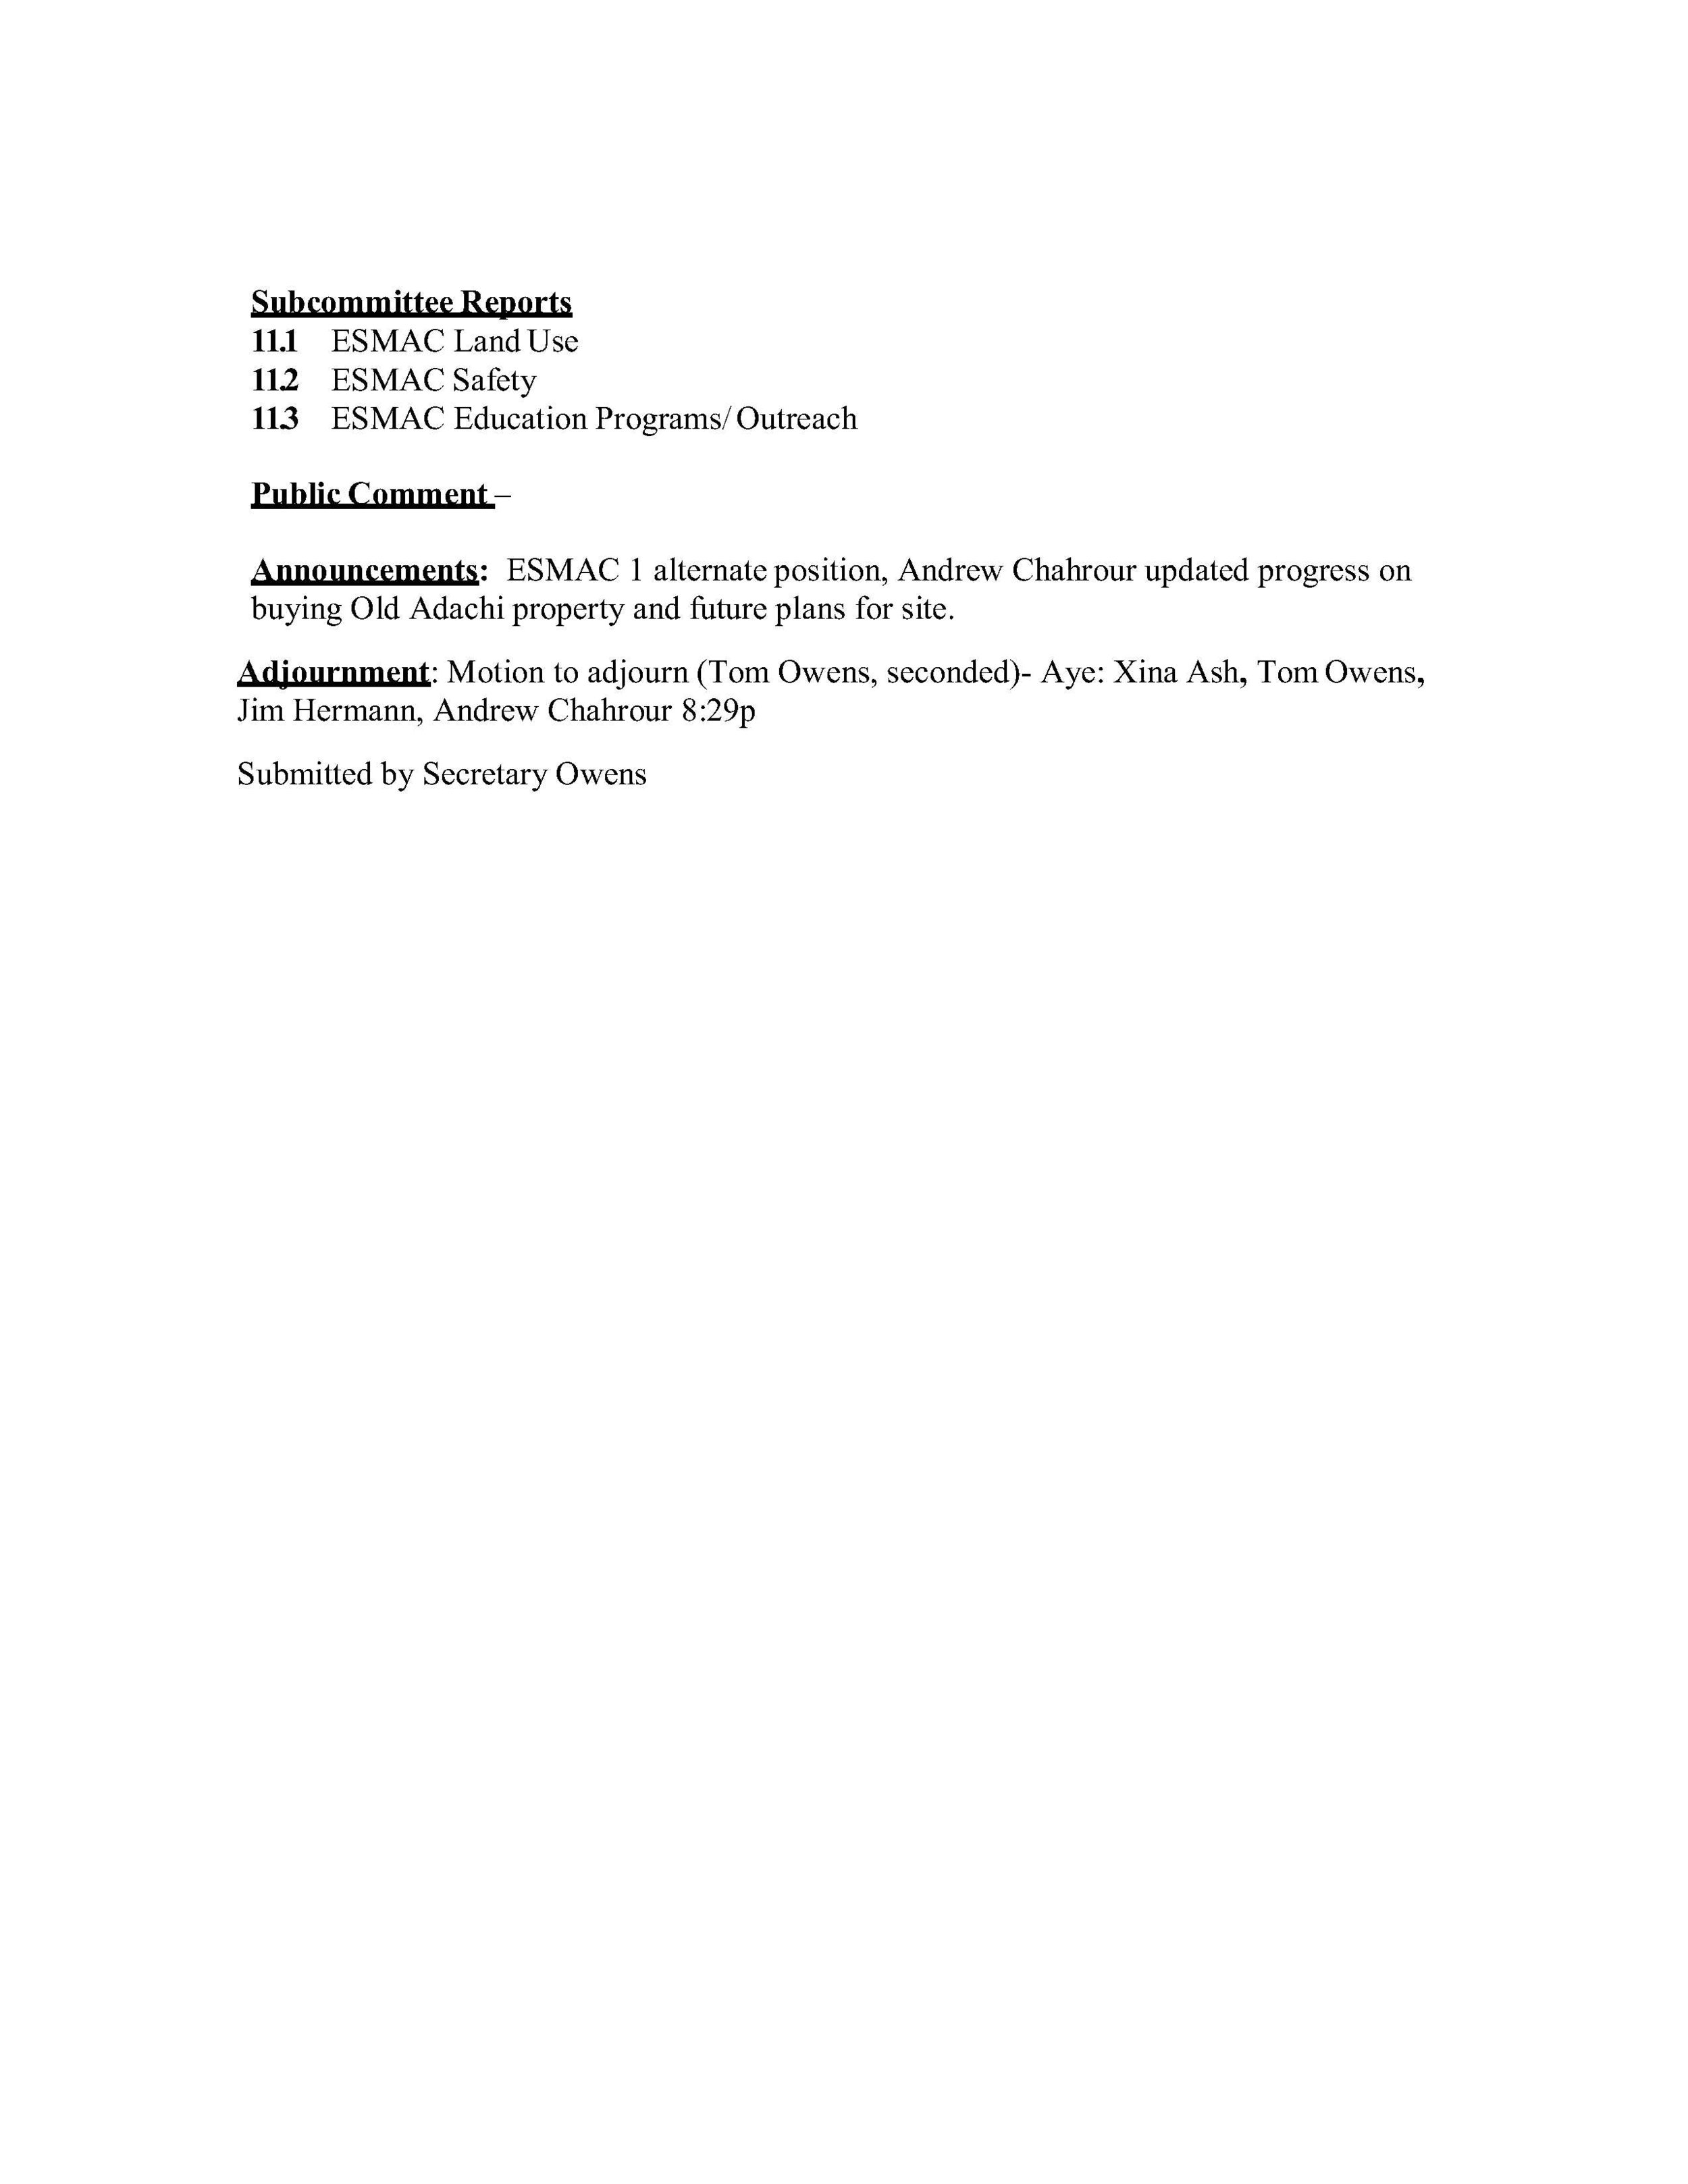 ESMAC Agenda 4.10.19_4.jpg